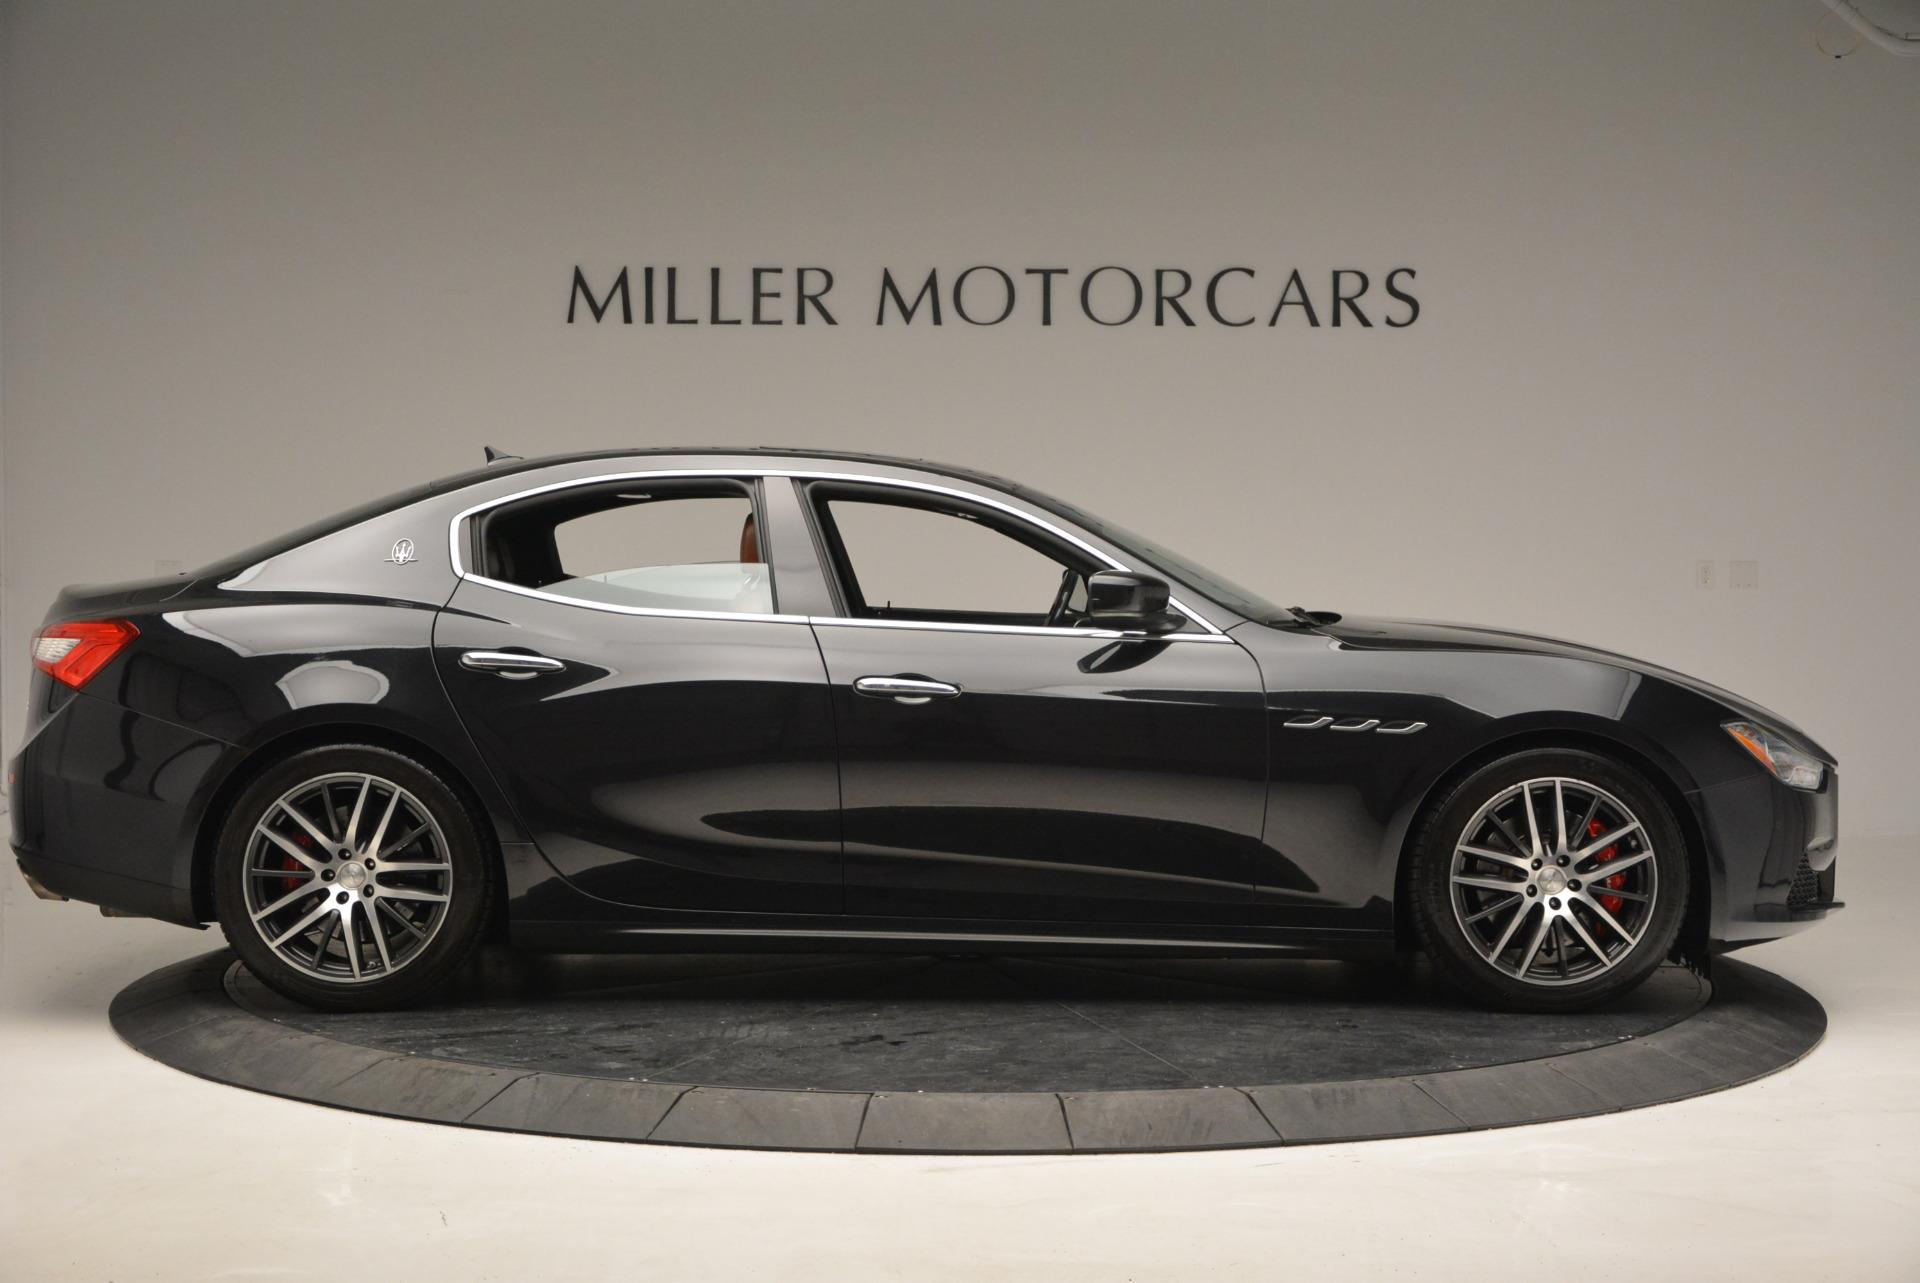 Used 2014 Maserati Ghibli S Q4 For Sale In Westport, CT 805_p9